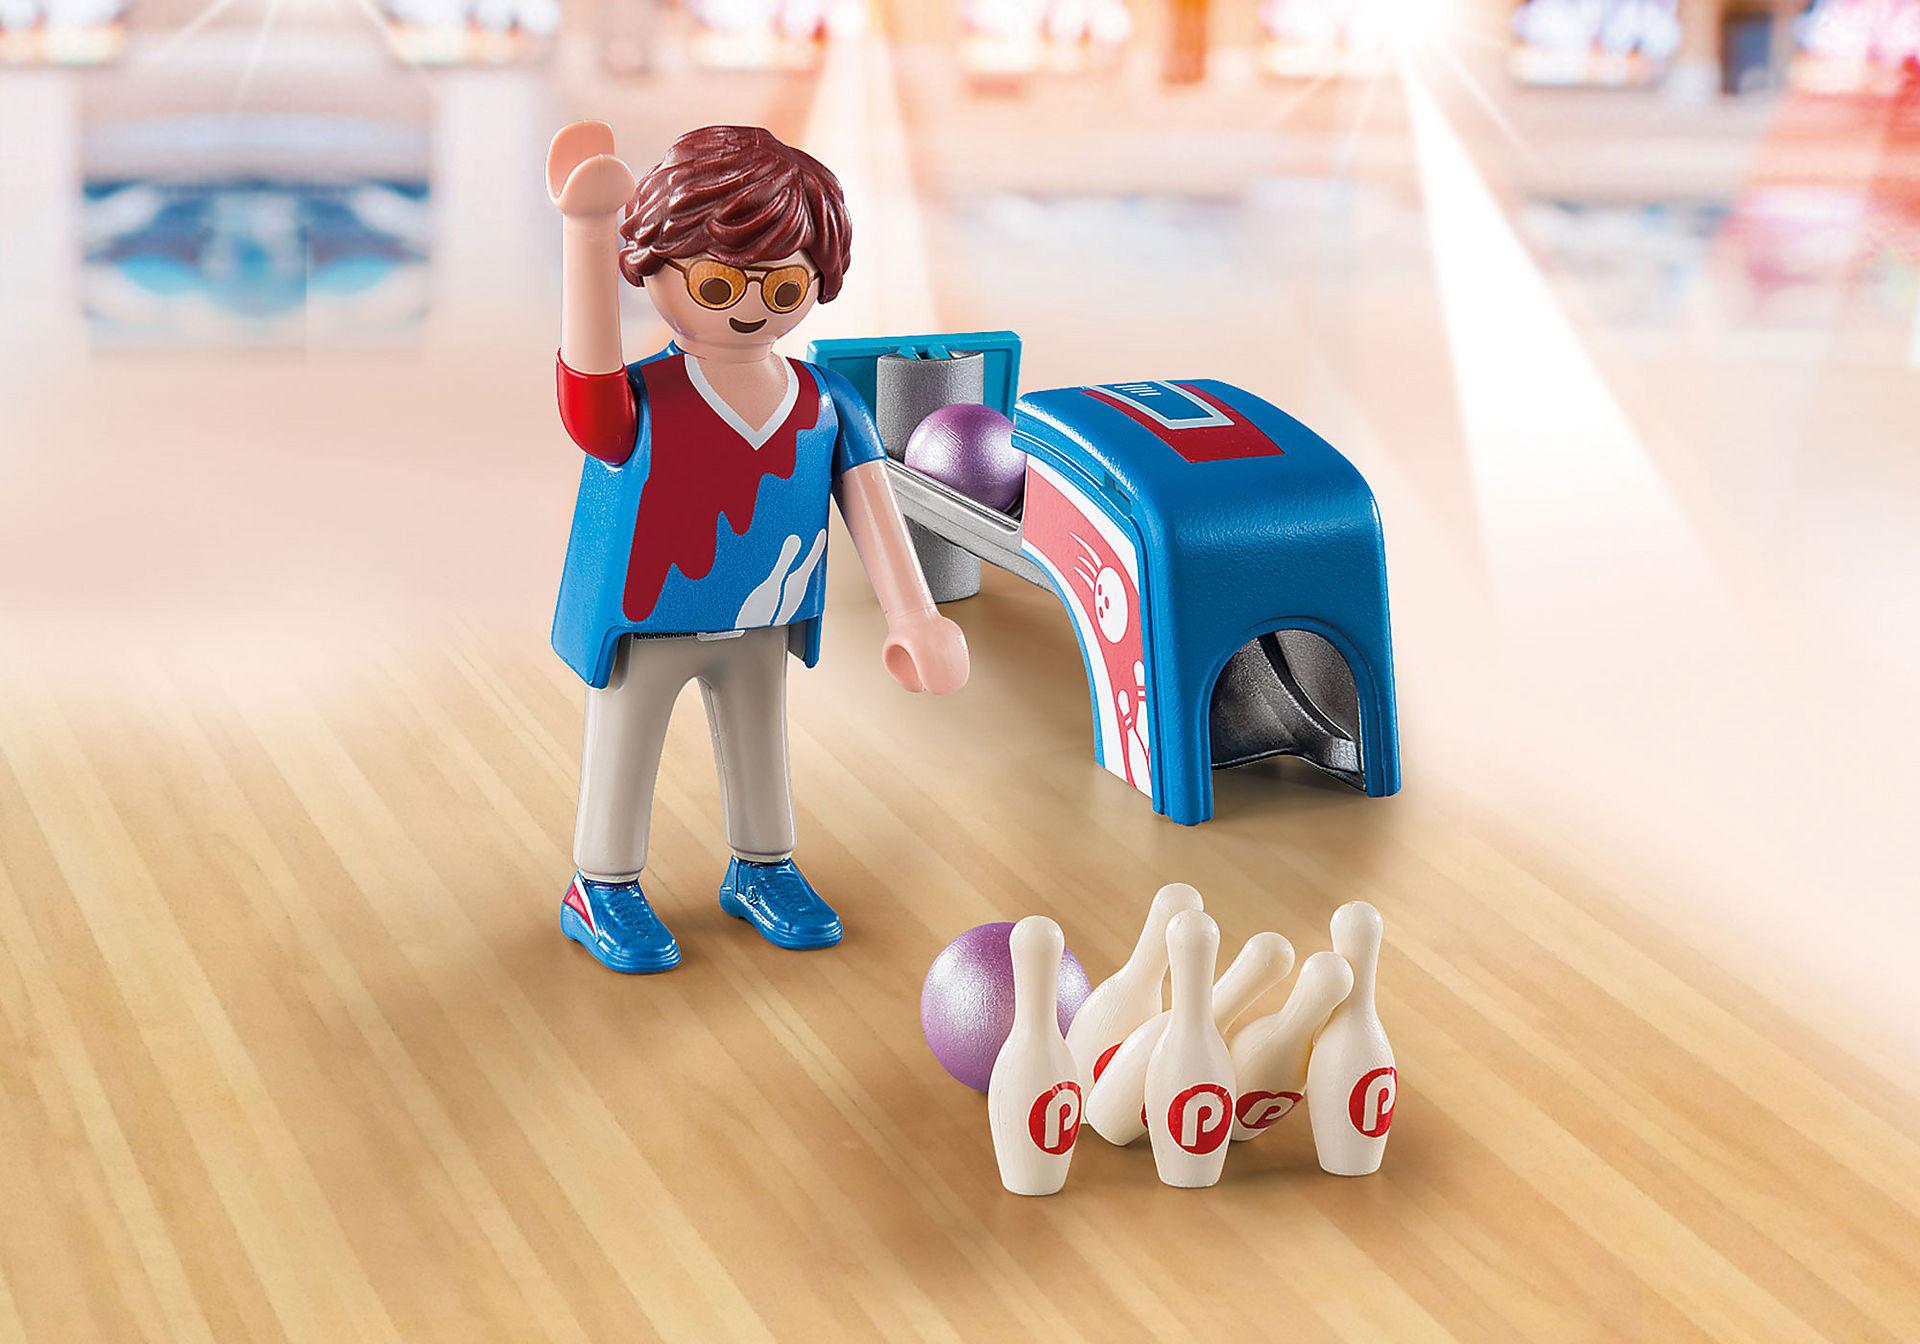 9440 Bowlingspelare zoom image1